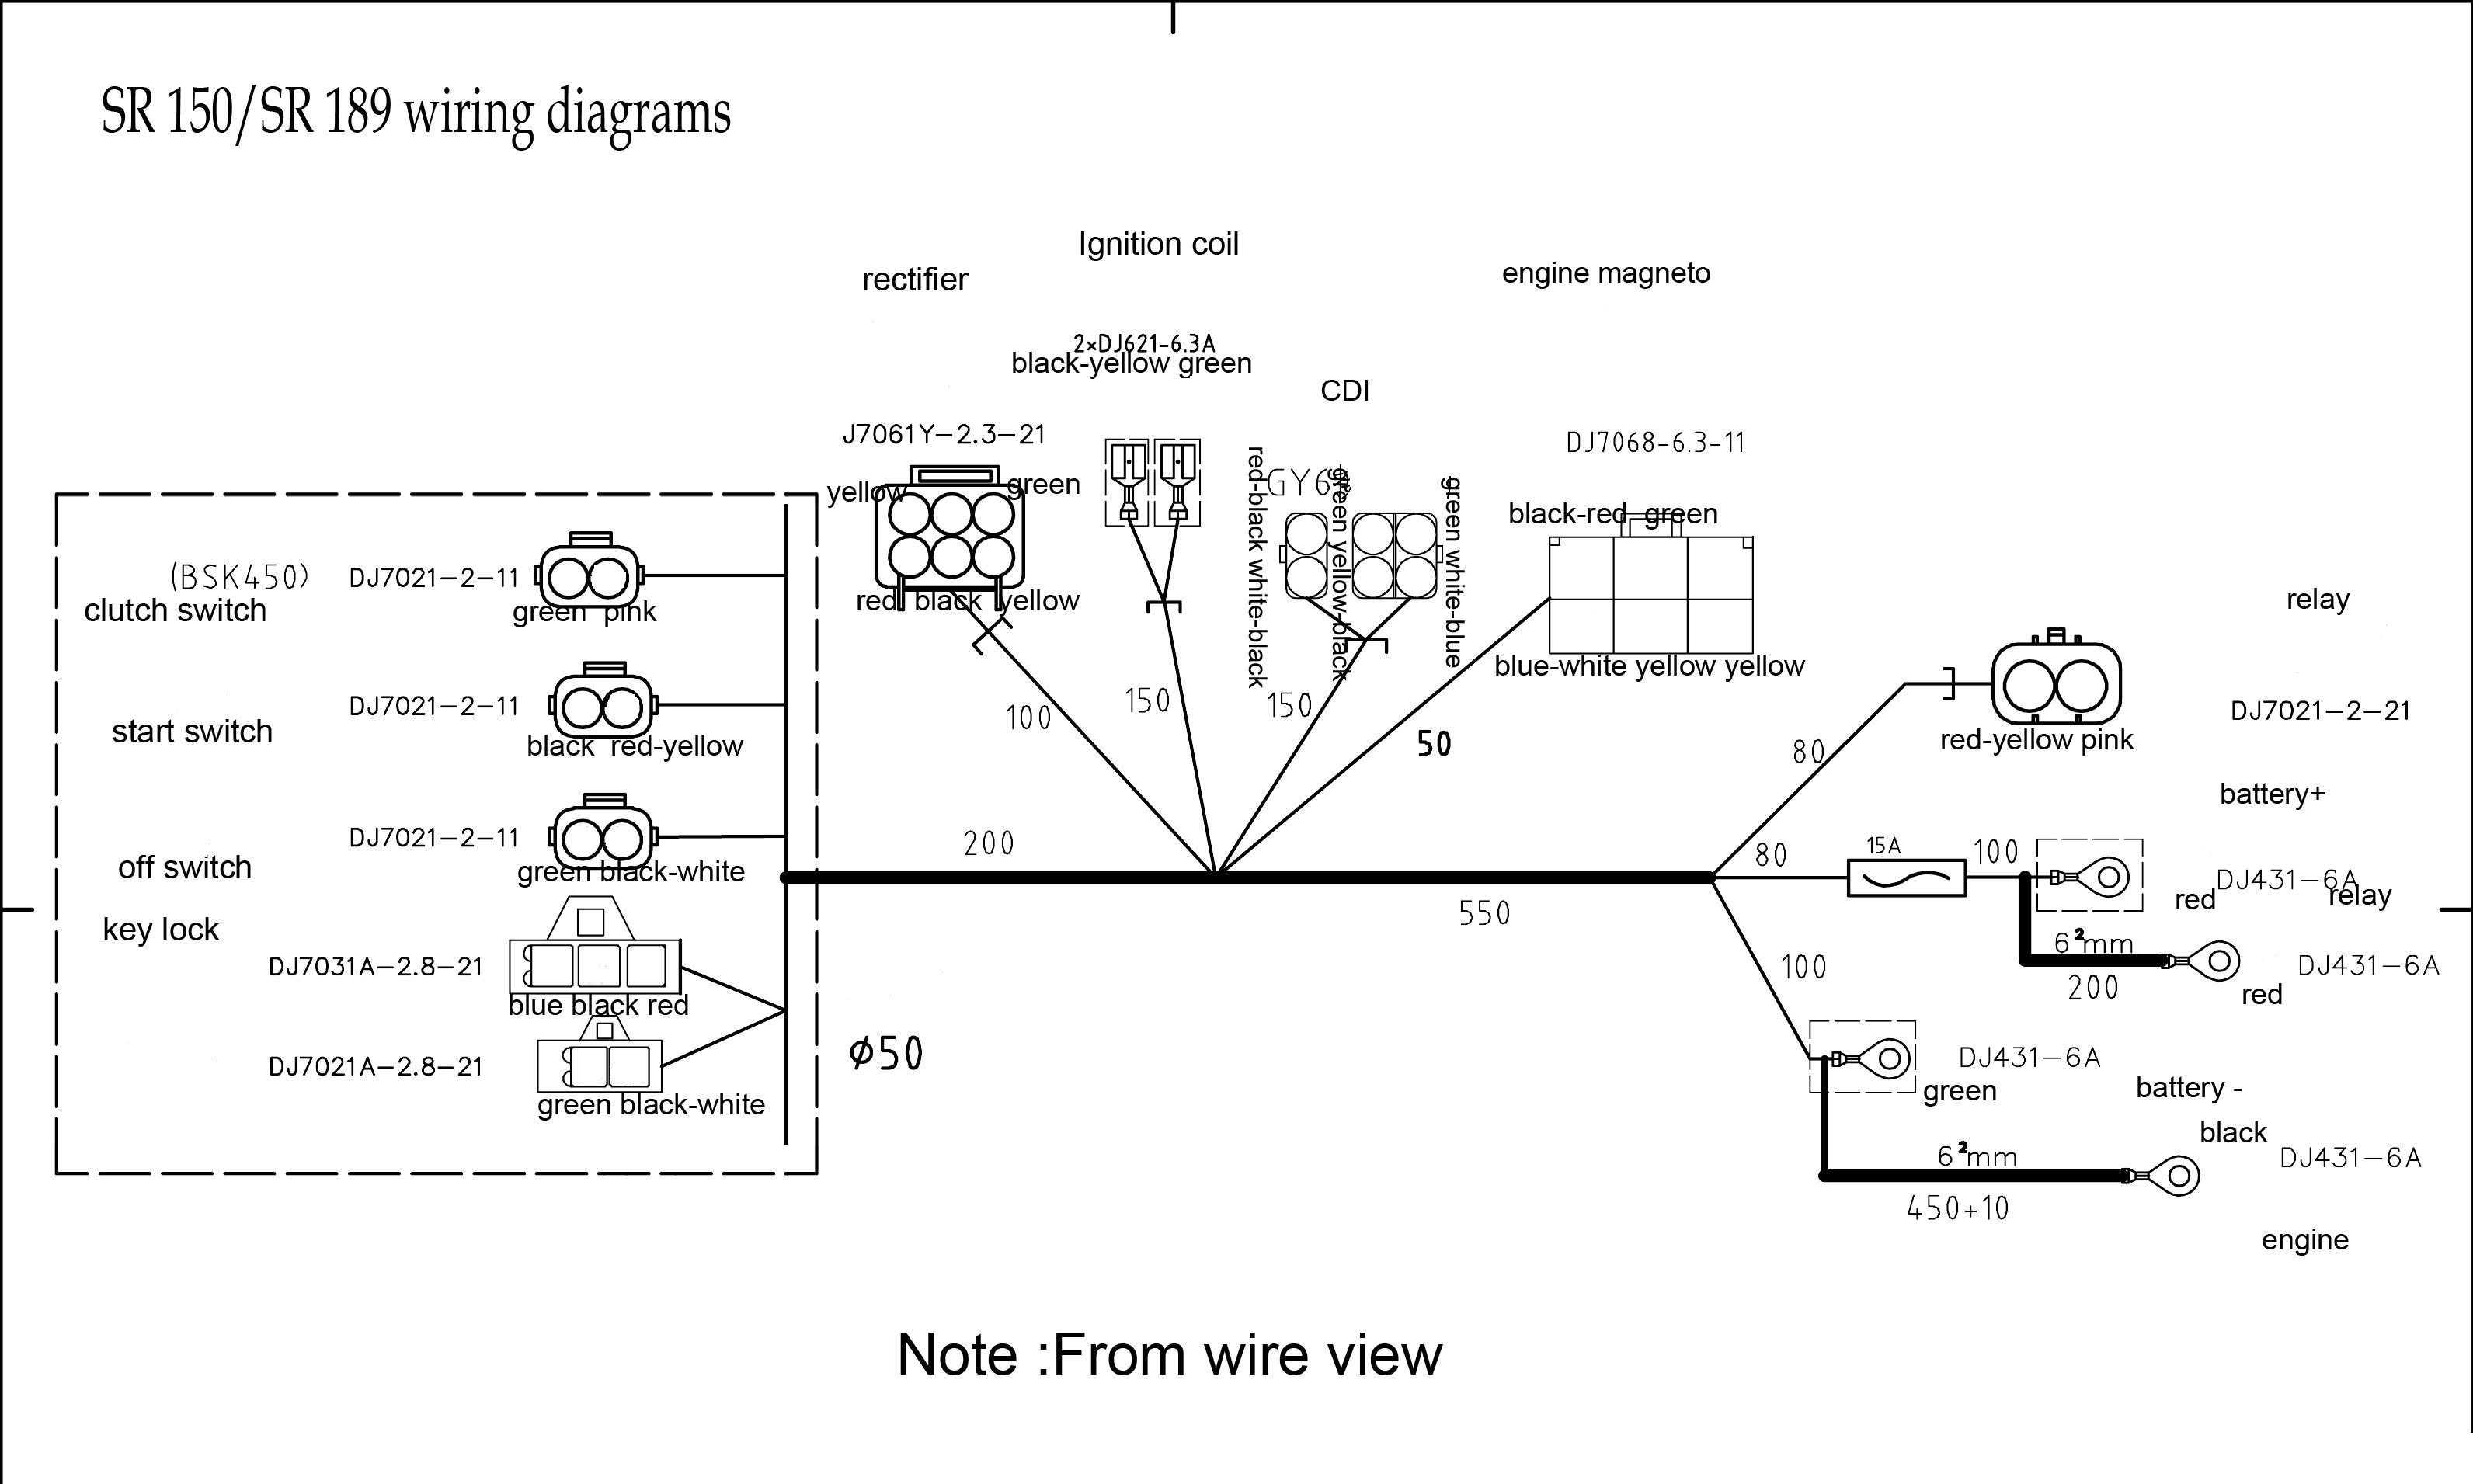 33 Yamaha Ttr 125 Parts Diagram - Wiring Diagram Database | Ttr125 Wiring Diagram |  | Wiring Diagram Database